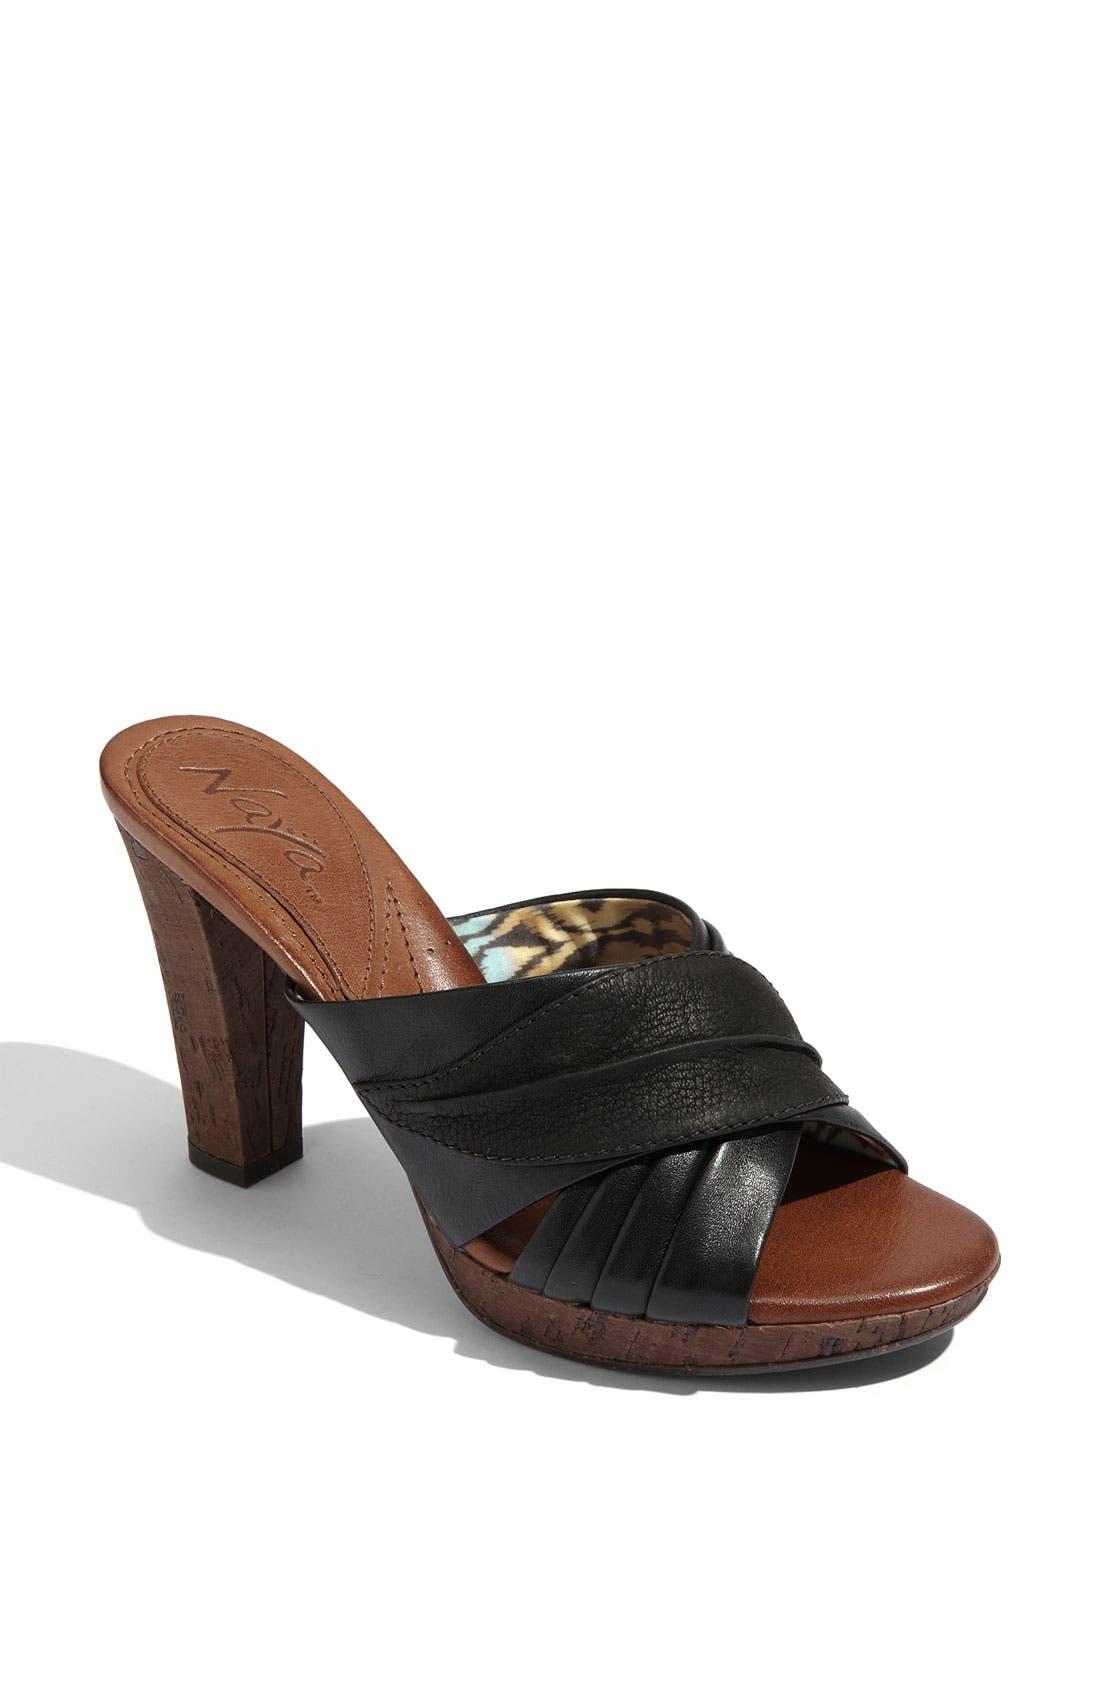 NAYA 'Willa' Sandal, Main, color, 001